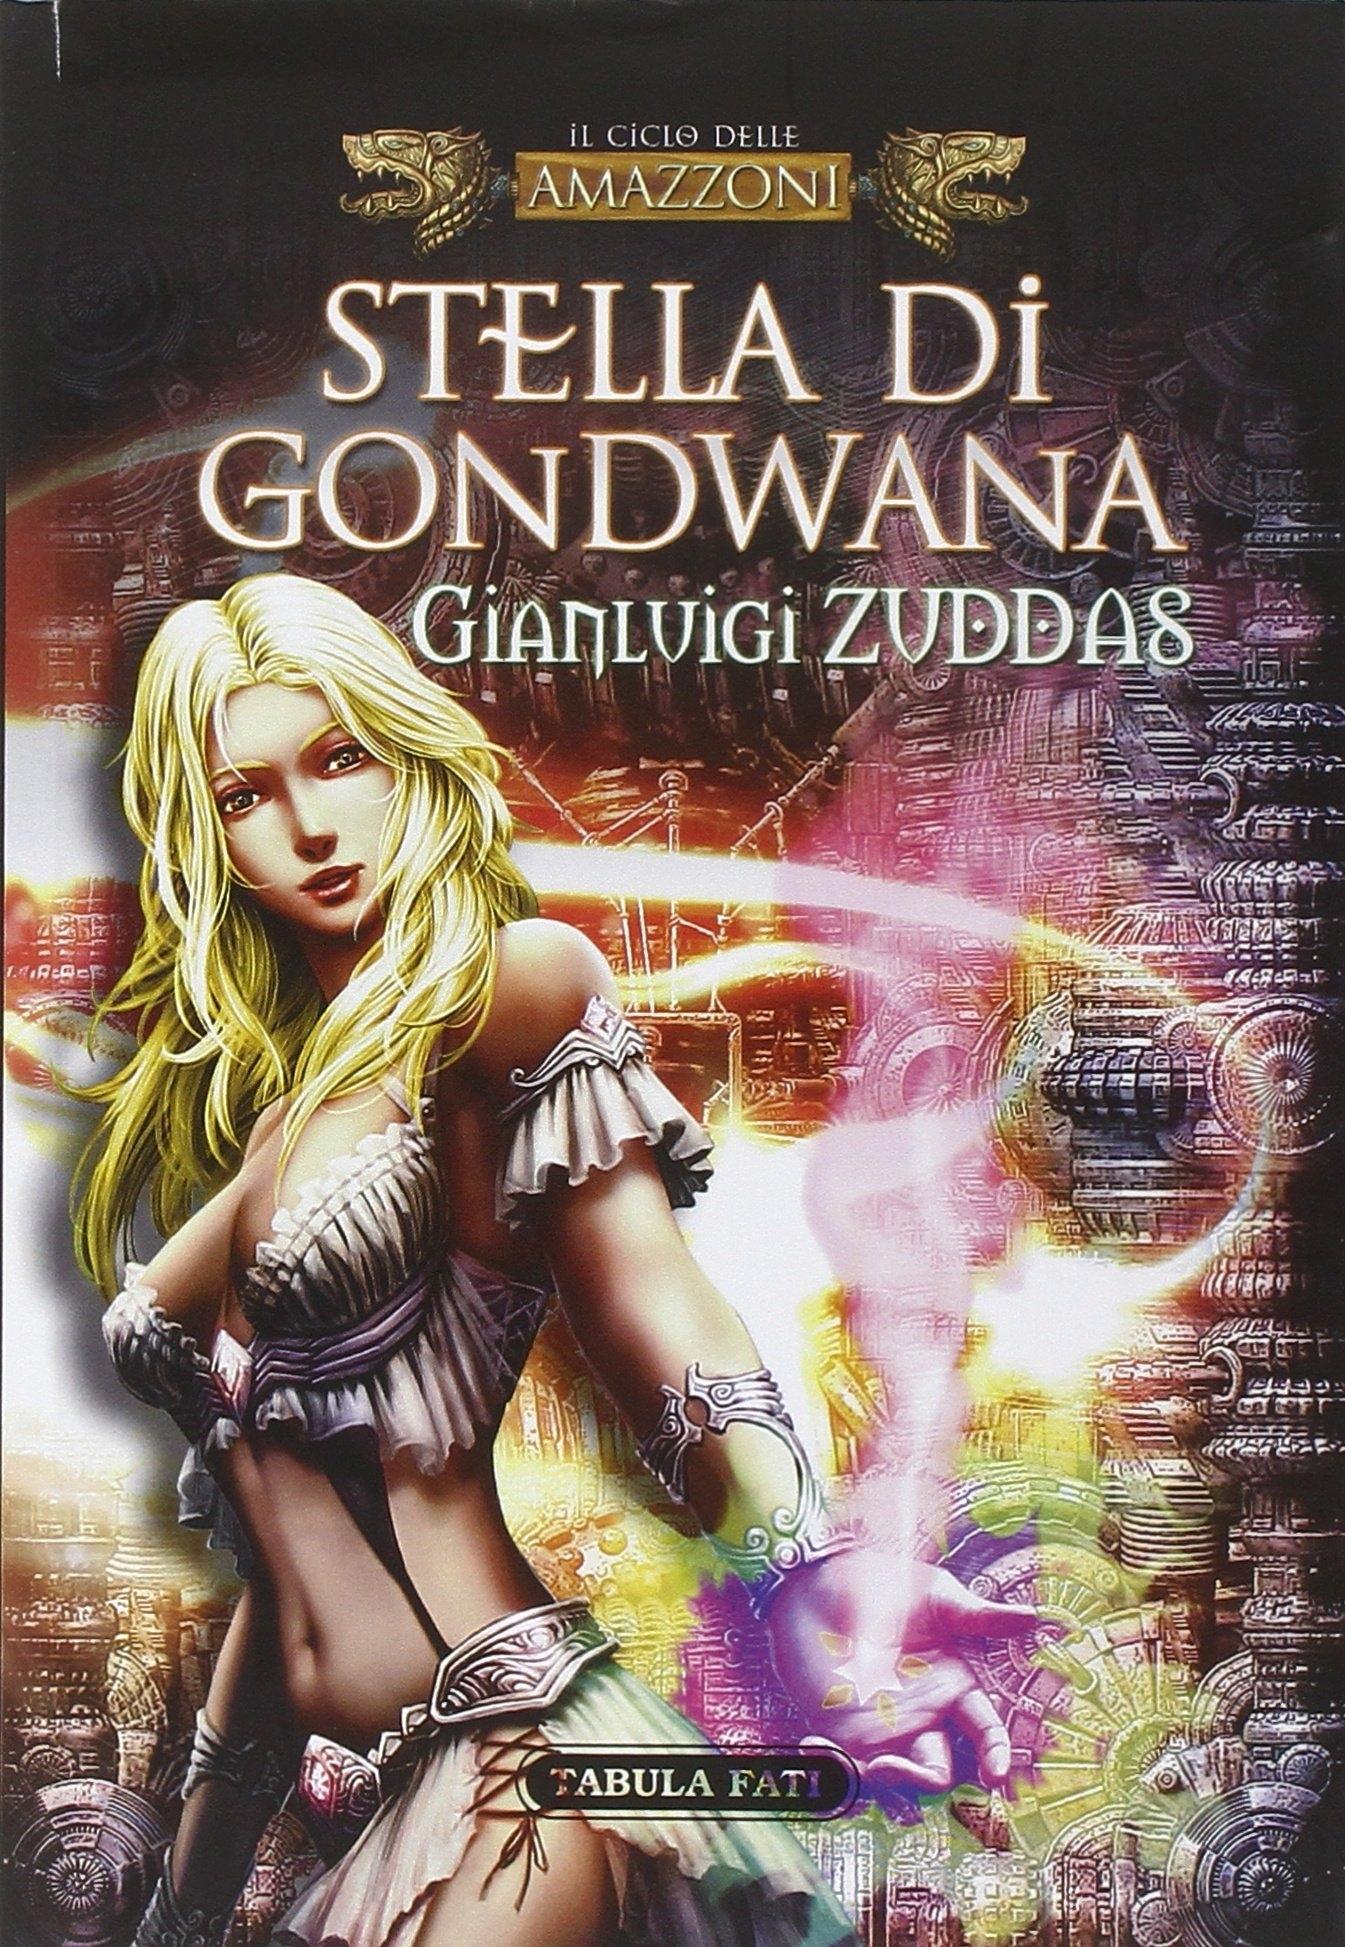 Stella di Gondwana.